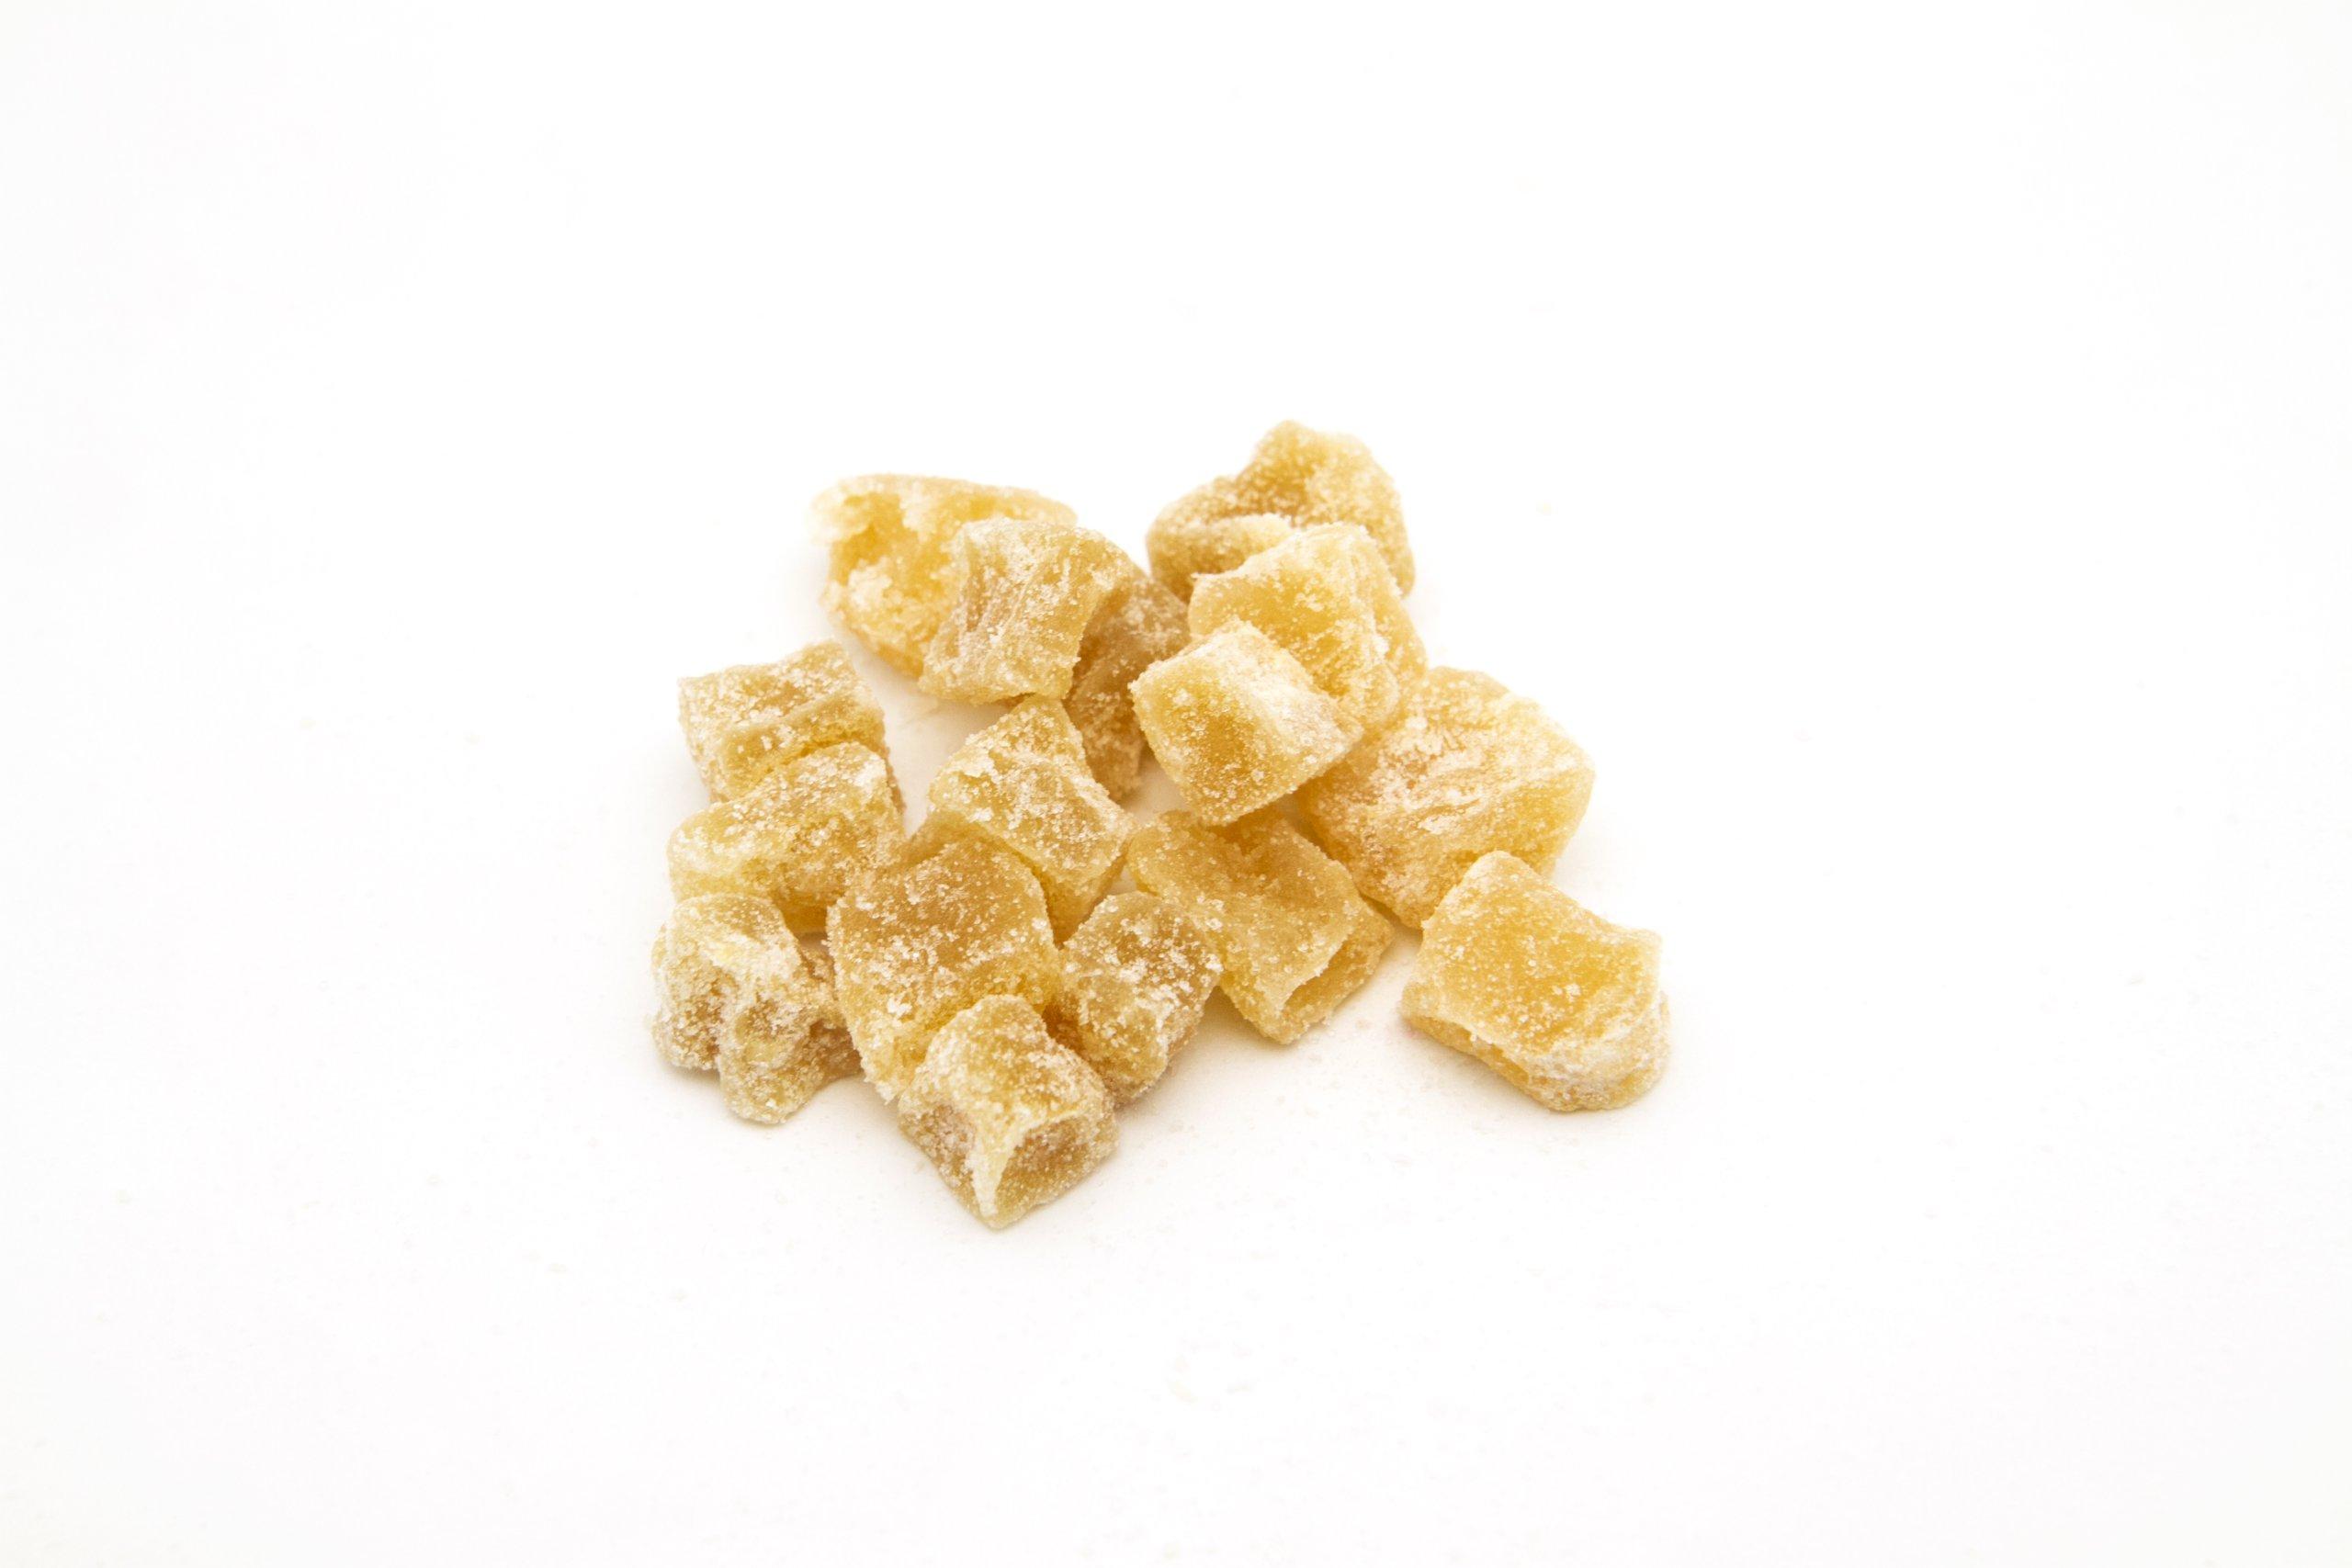 11 lb Bag Bulk Pack Crystallized Ginger Cubes 12-20mm